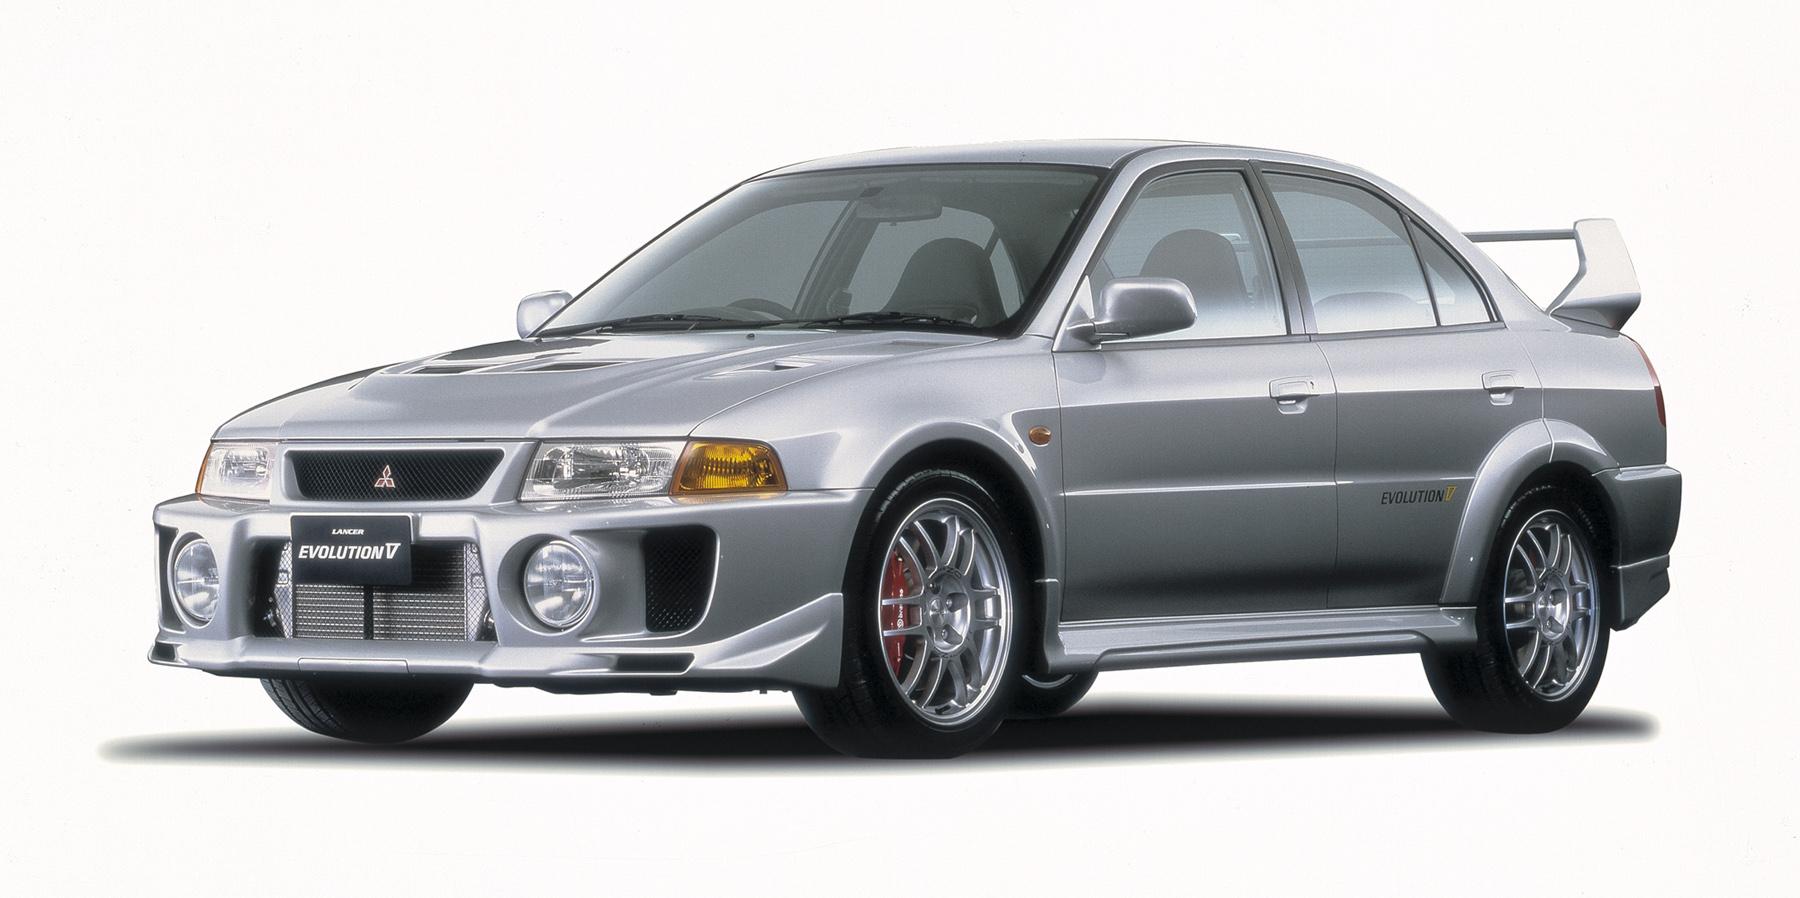 Mitsubishi Lancer Evolution IV 1996 - 1998 Sedan #1